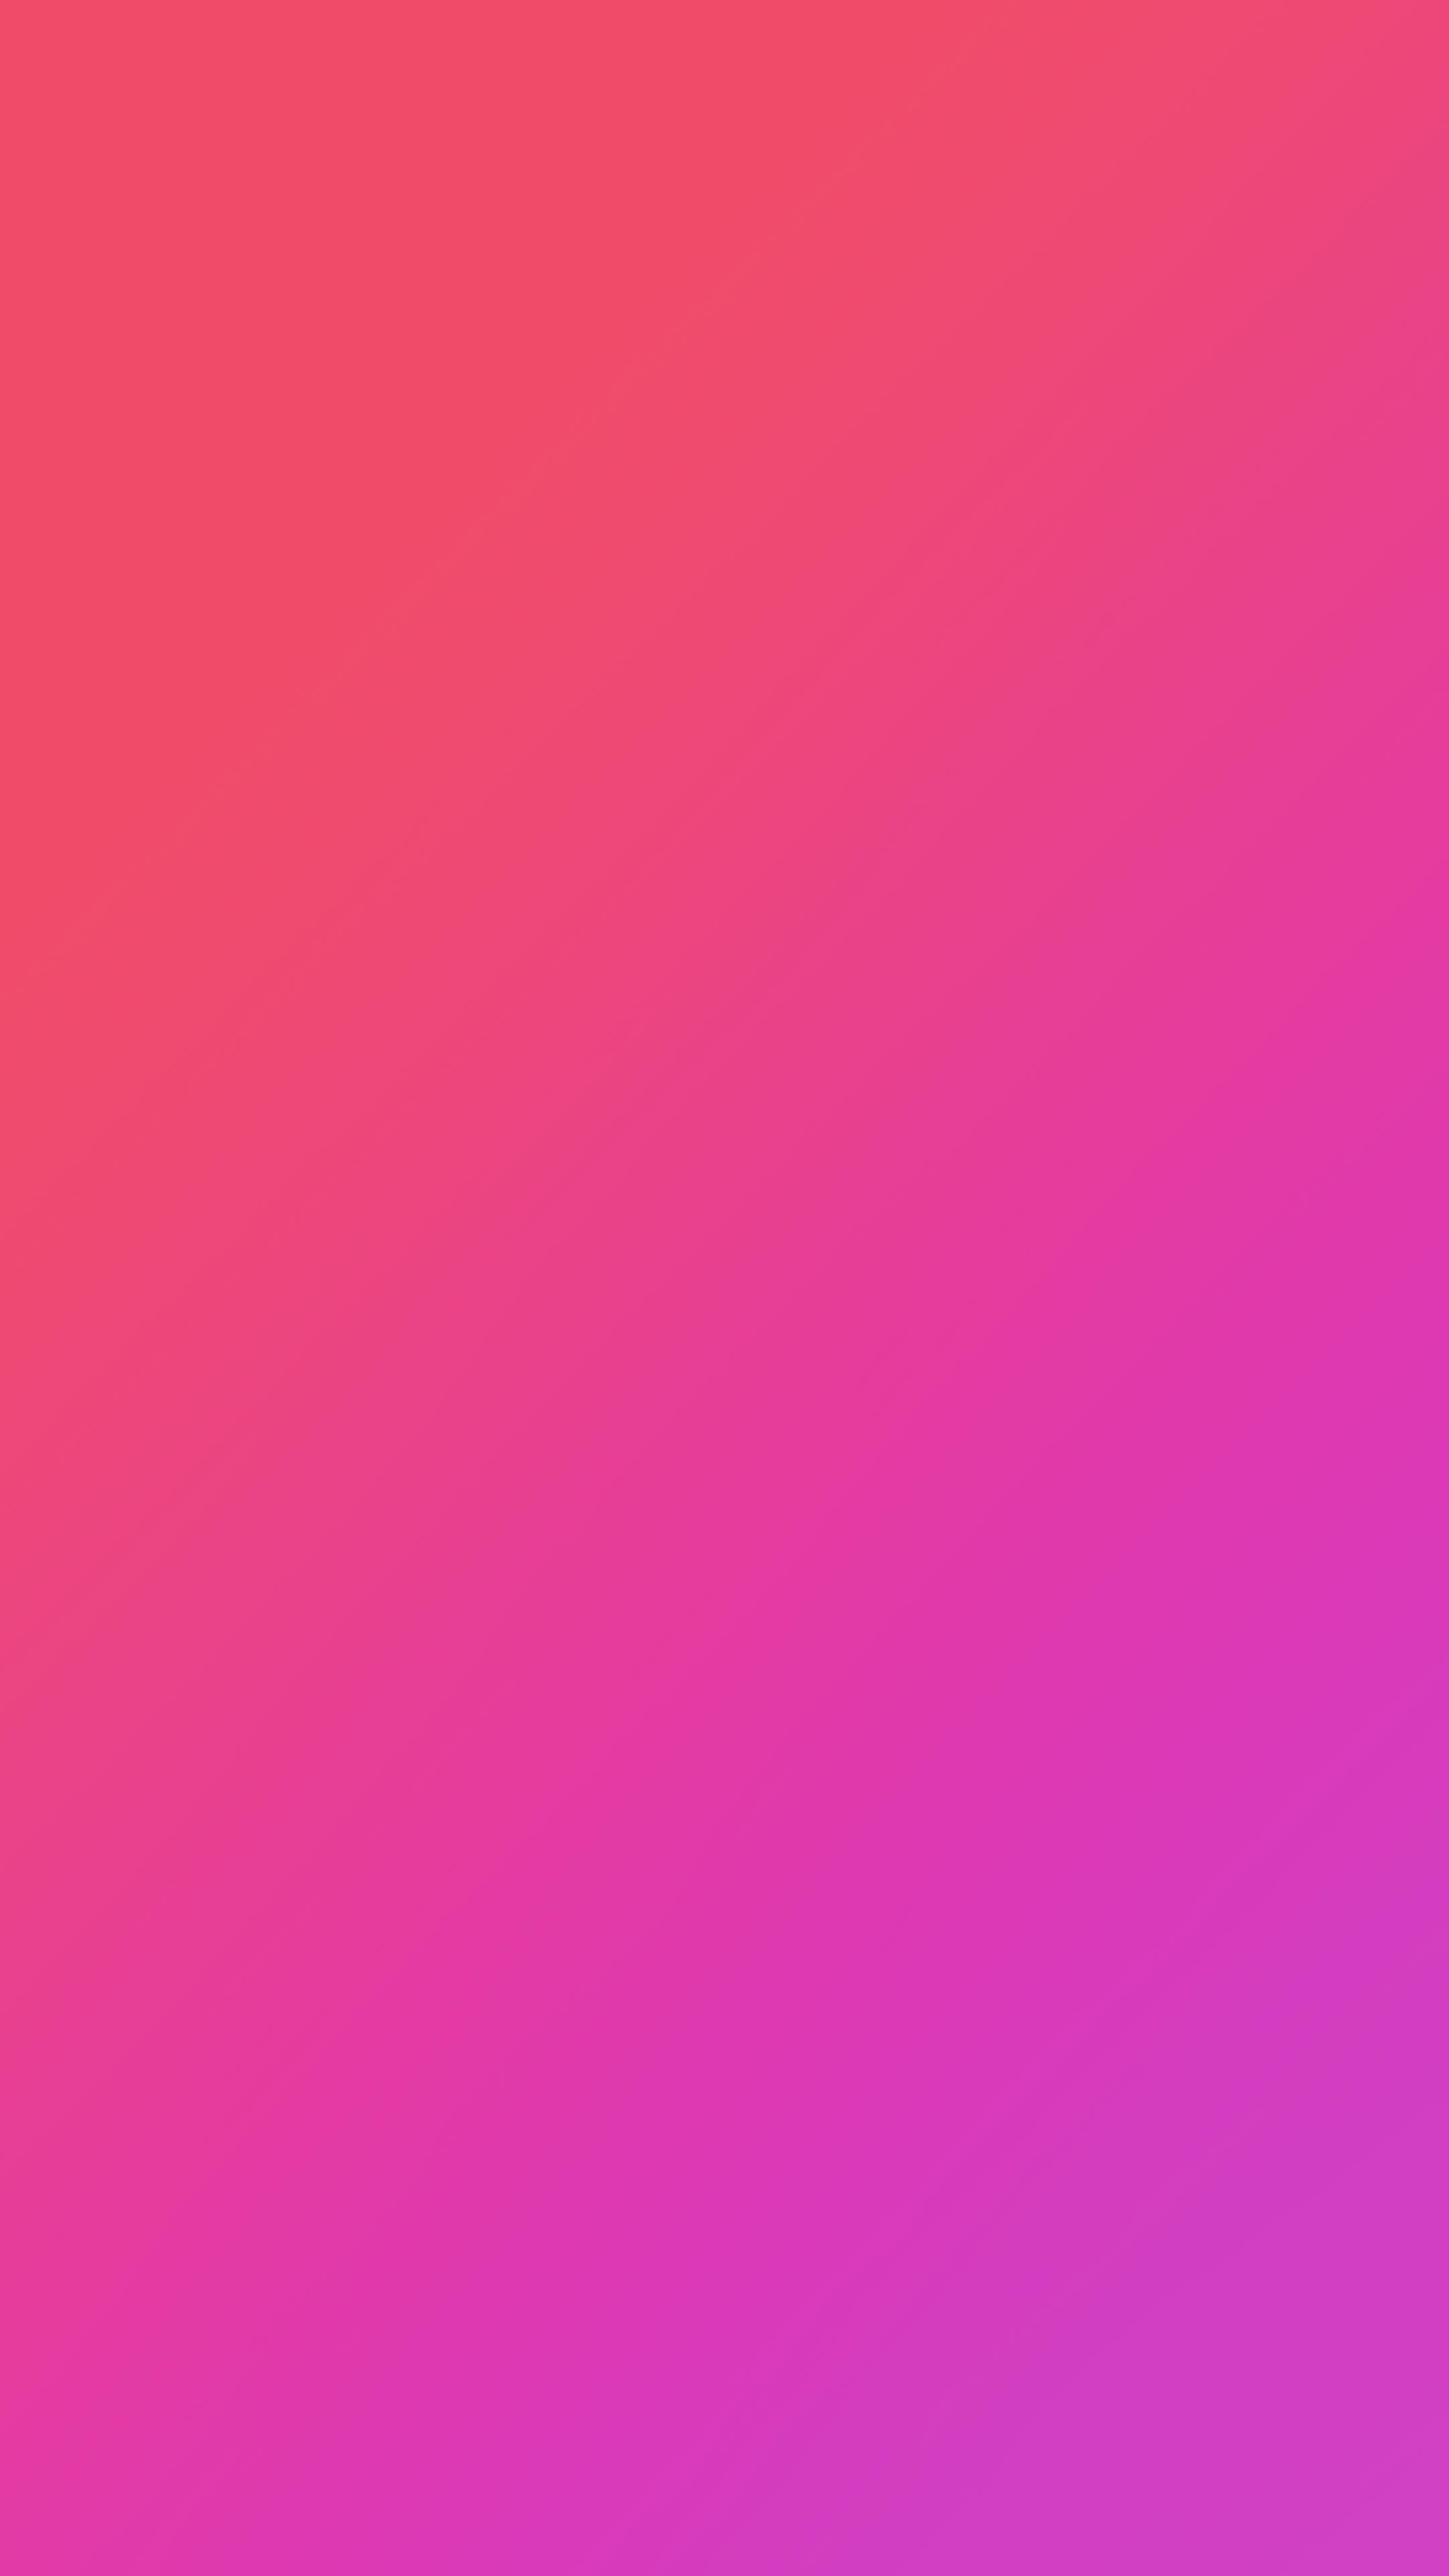 Gradient Wallpapers Iphone , HD Wallpaper & Backgrounds